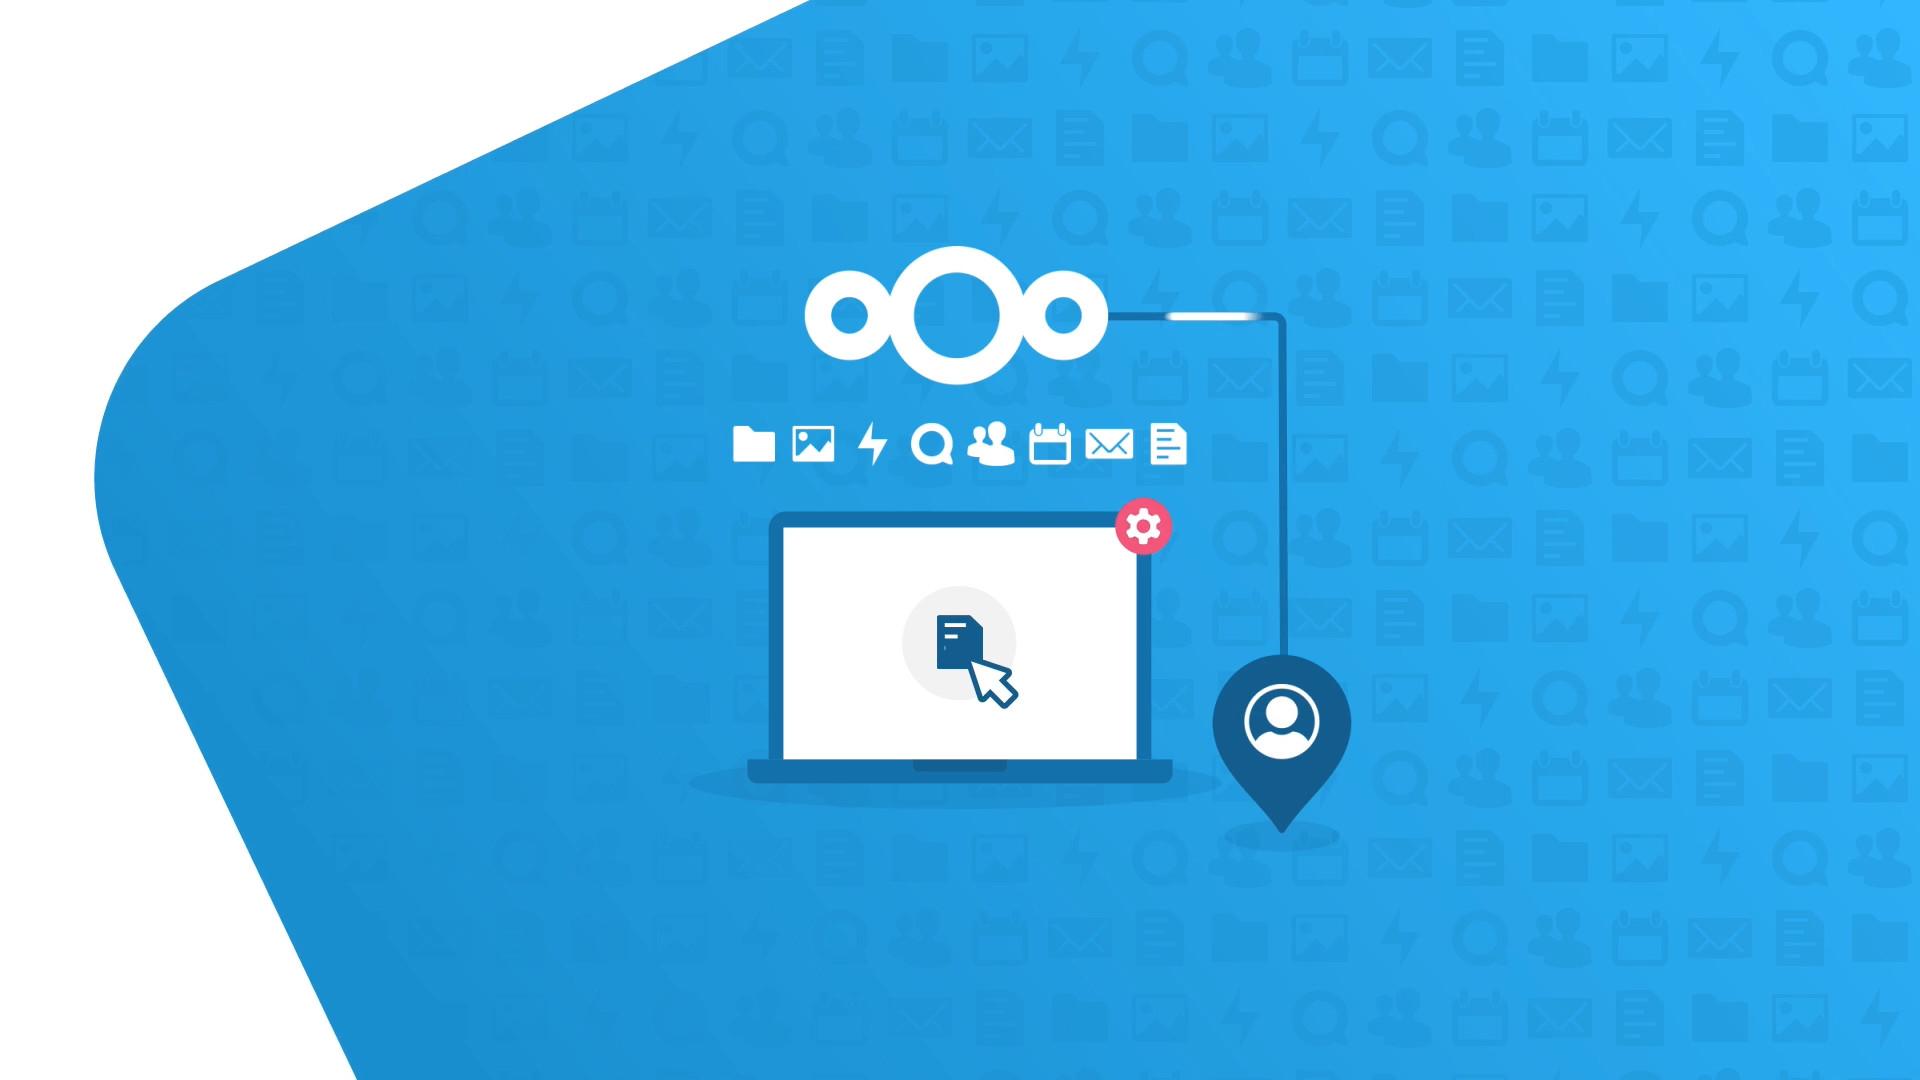 Home-Office-video-thumb.jpg